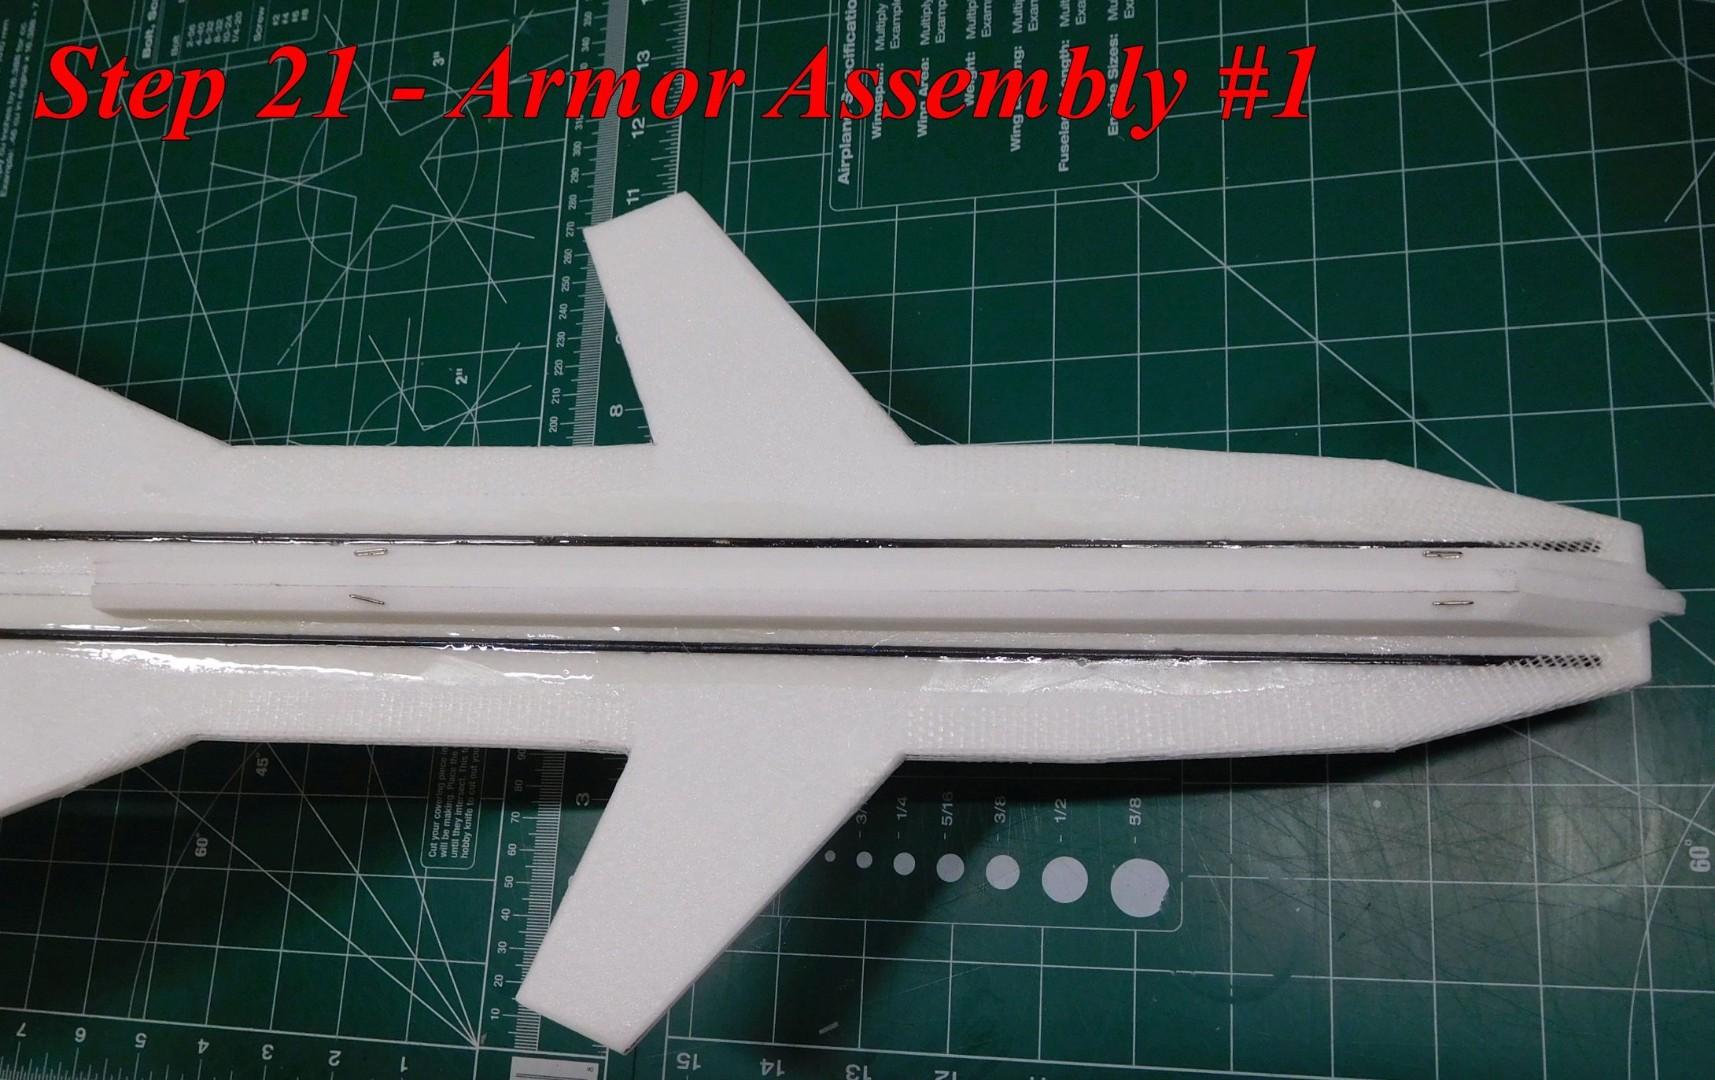 Step 21 Pic 2 - Armor Assembly #1.jpg